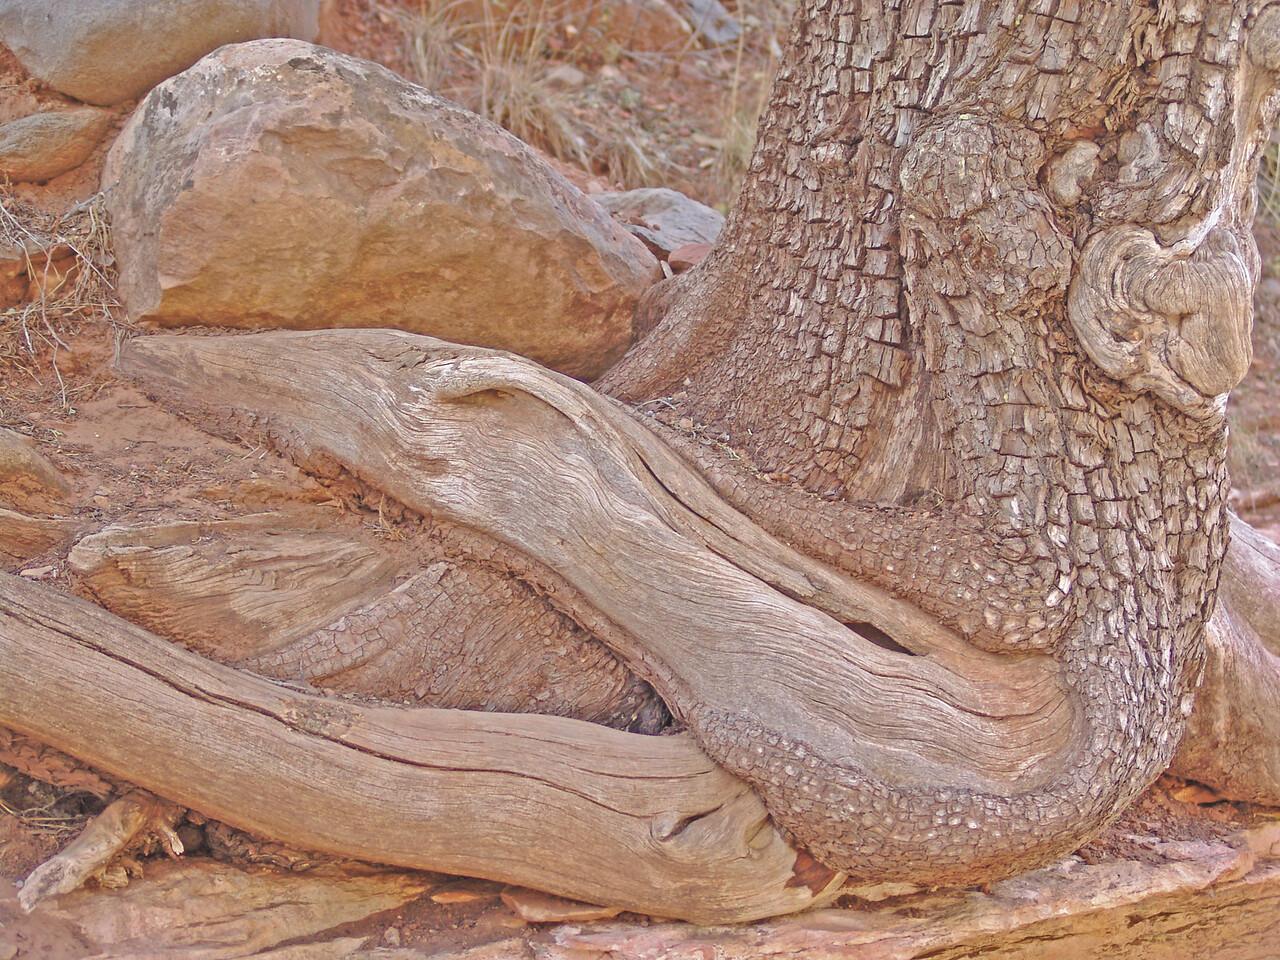 TRUNK FORMATION AT SLIDE ROCK STATE PARK, ARIZONA